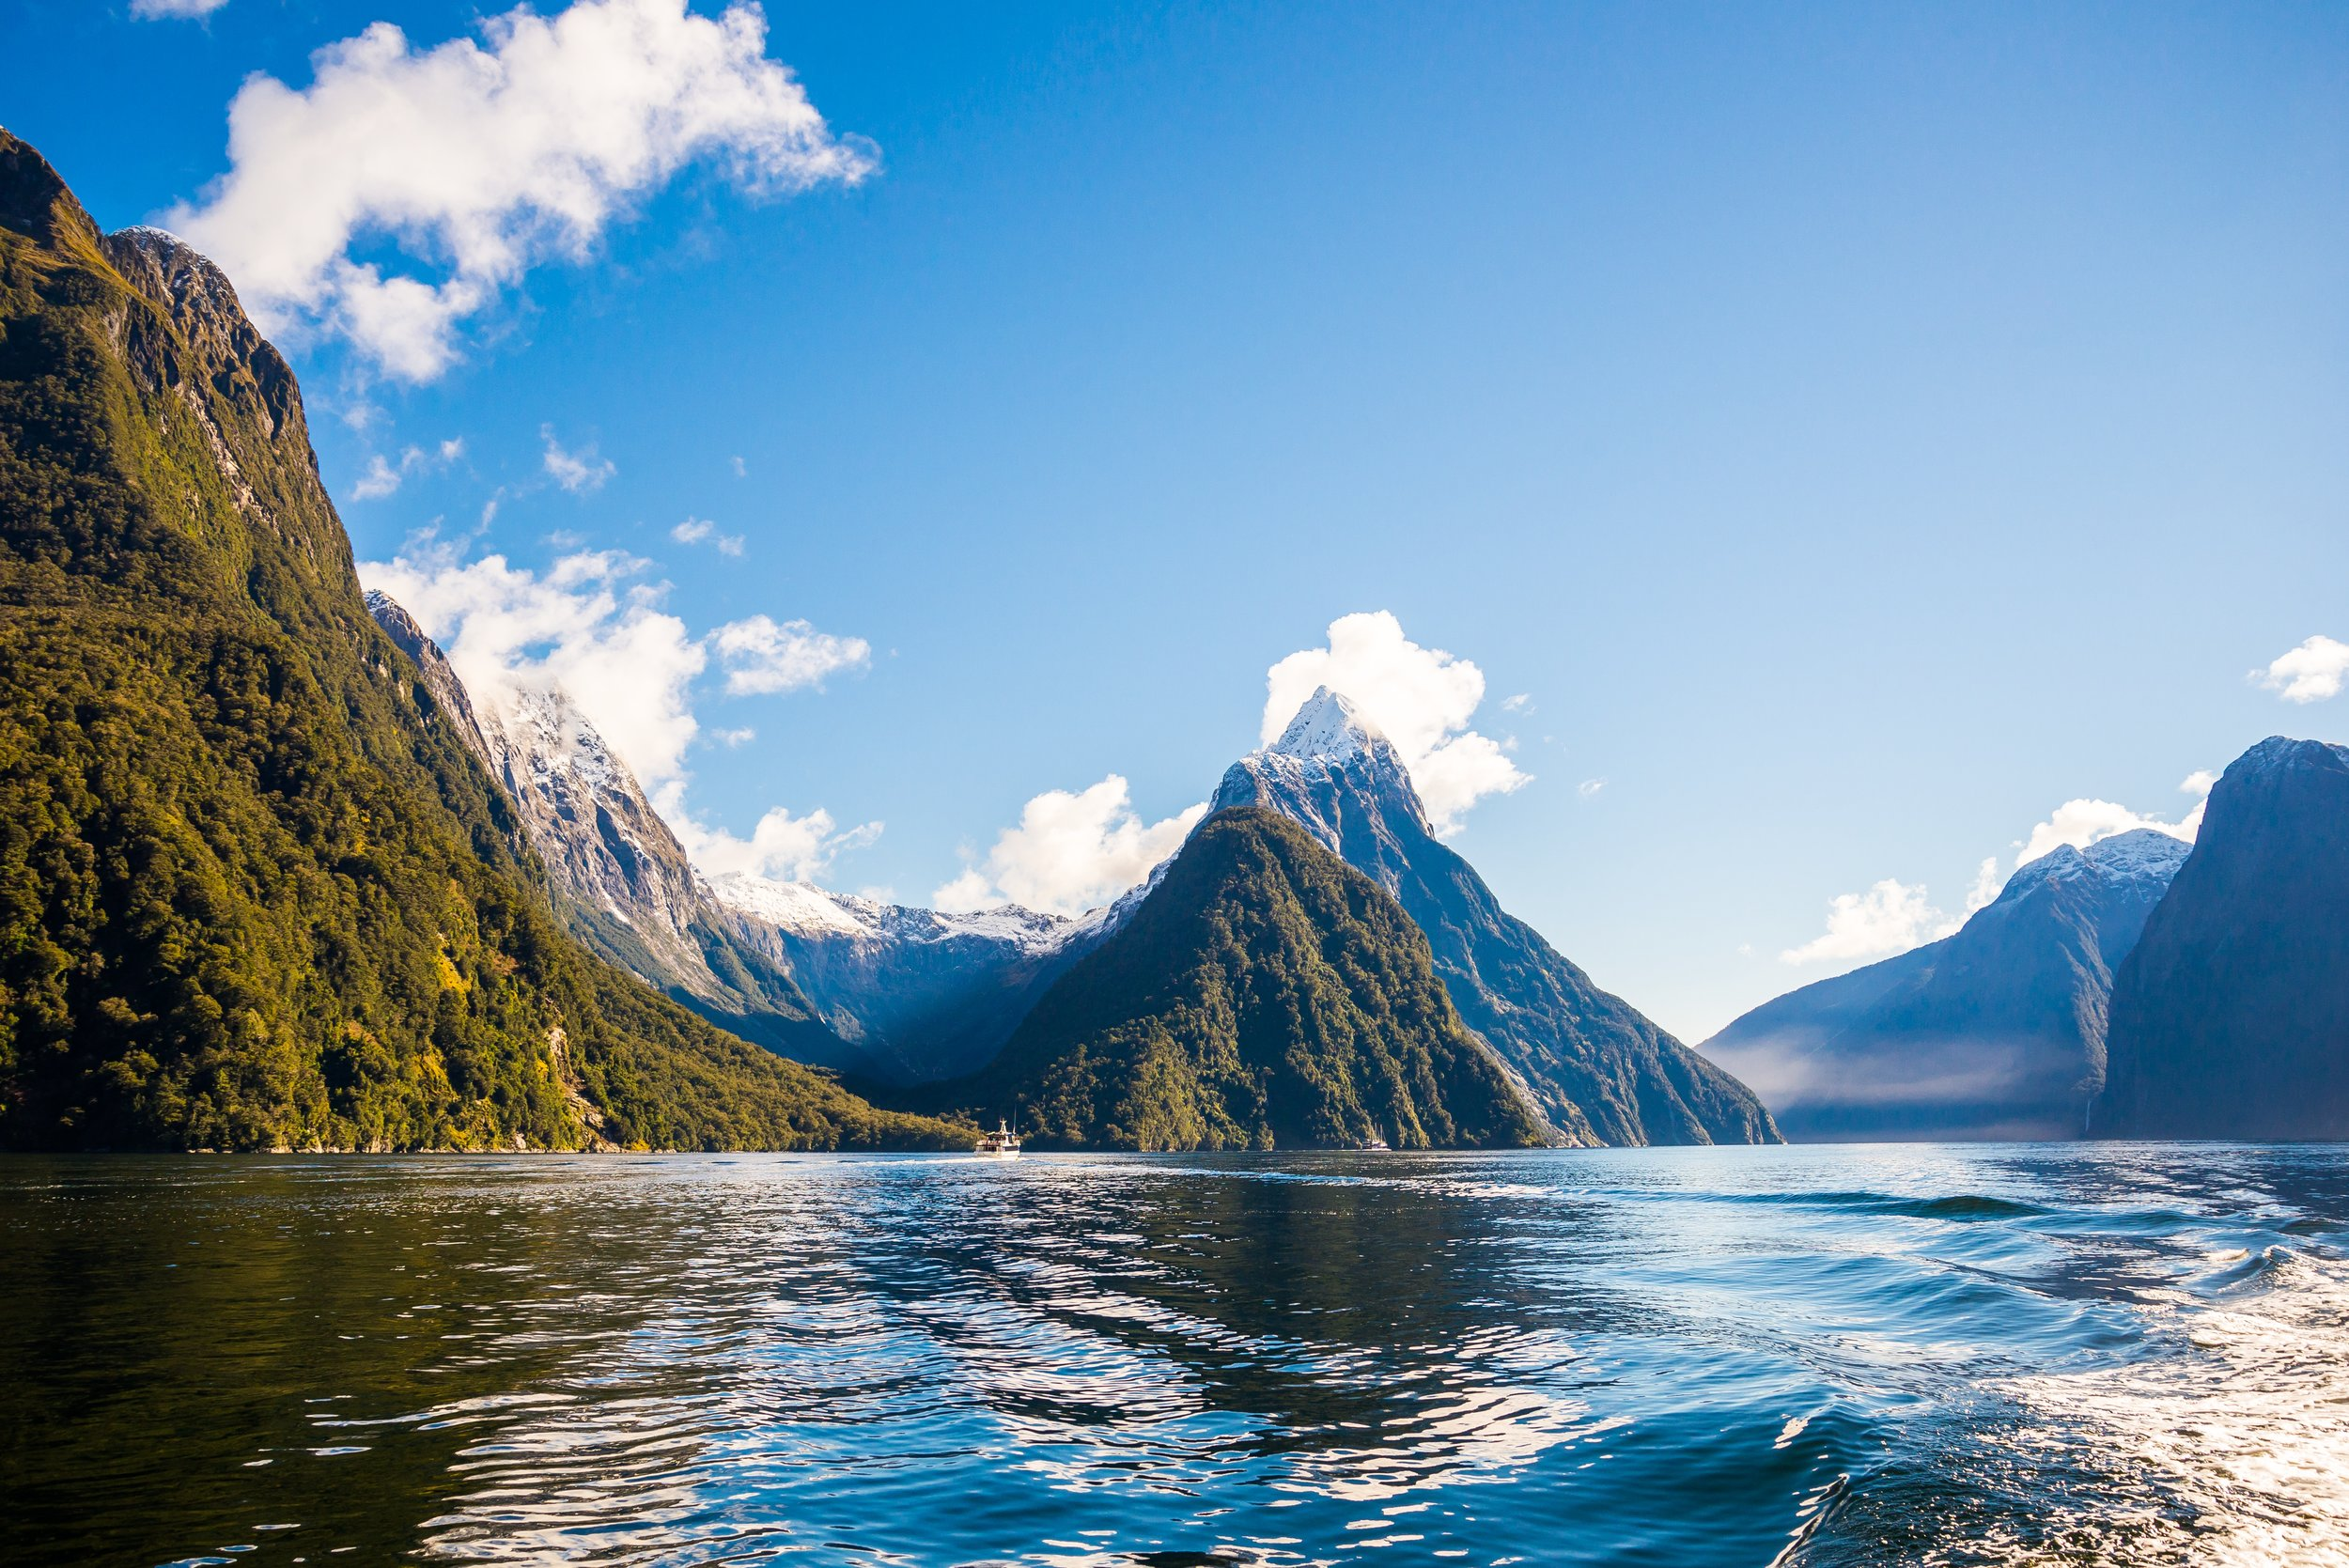 Boston Luxury Custom Honeymoon Travel Agent Advisor Planning New Zealand Milford Sound.jpeg